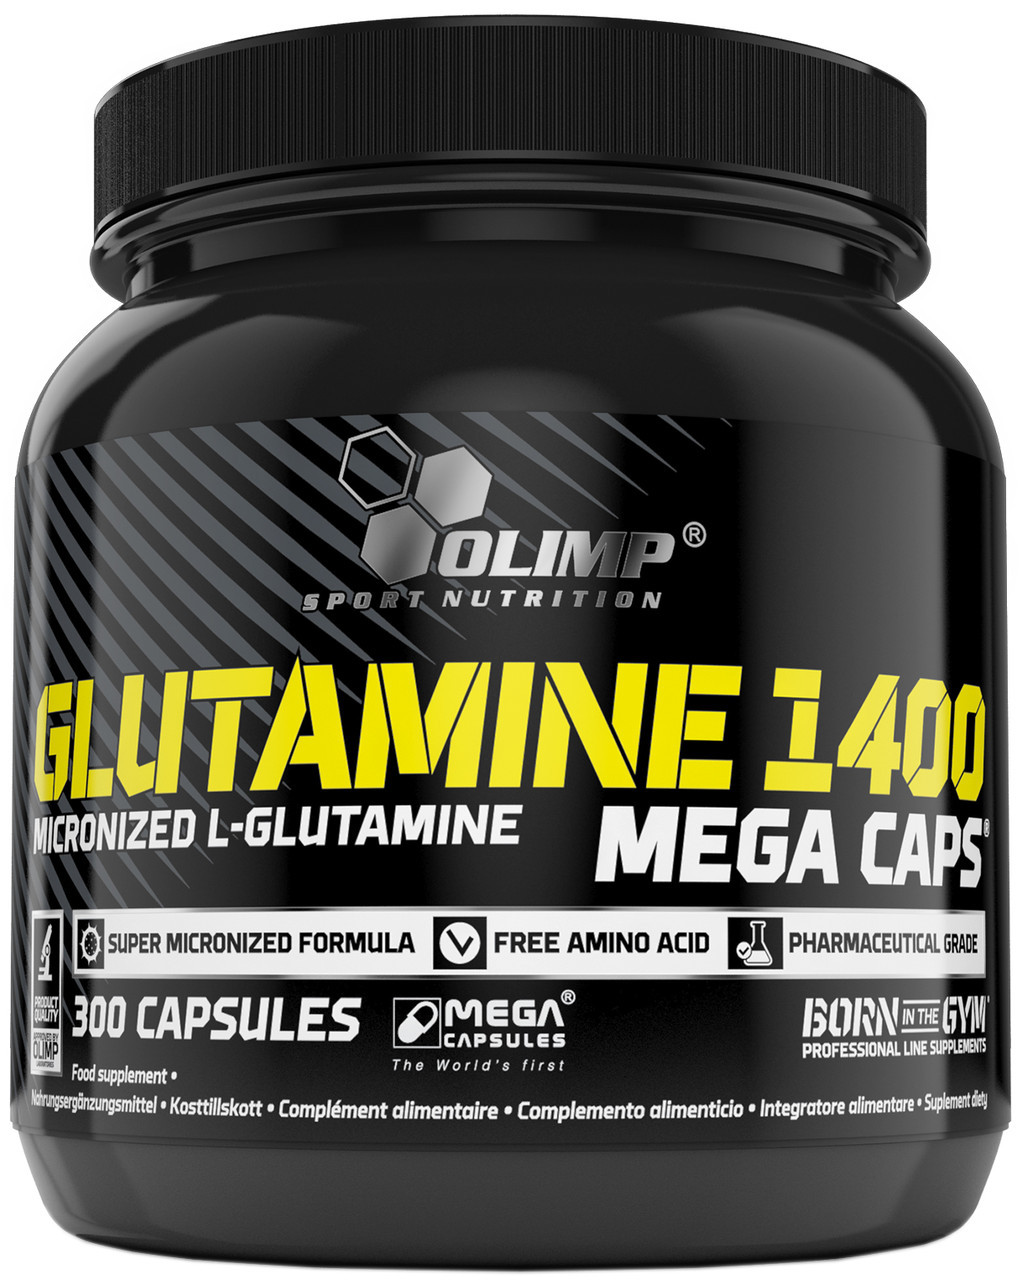 Glutamine Mega Caps 1400 Olimp (300 капс.)